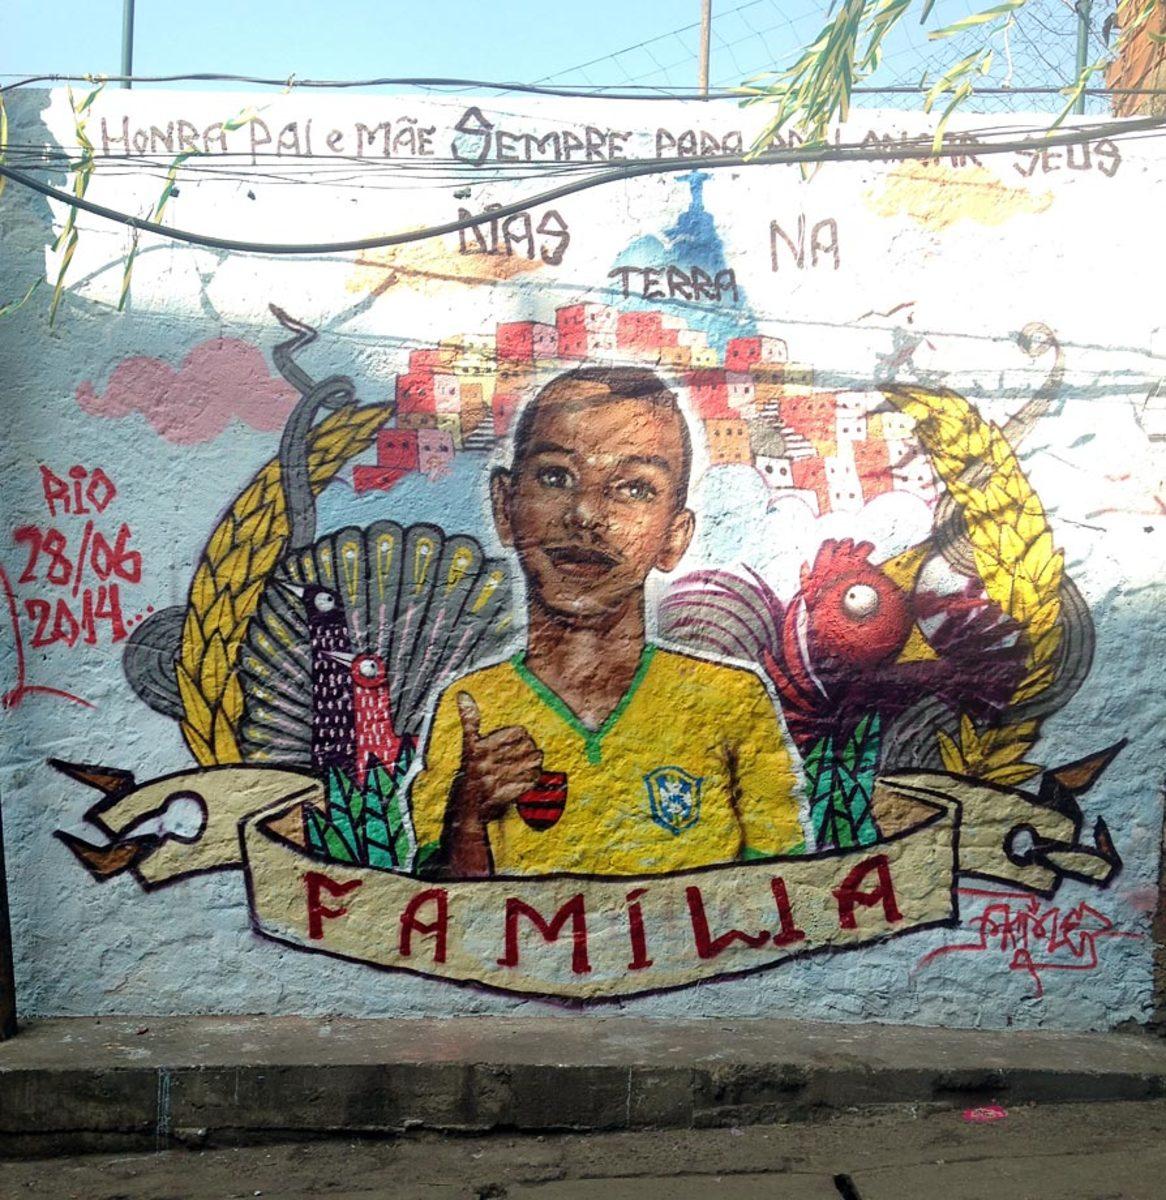 soccer-graffiti-mural-rio-IMG_8570.jpg